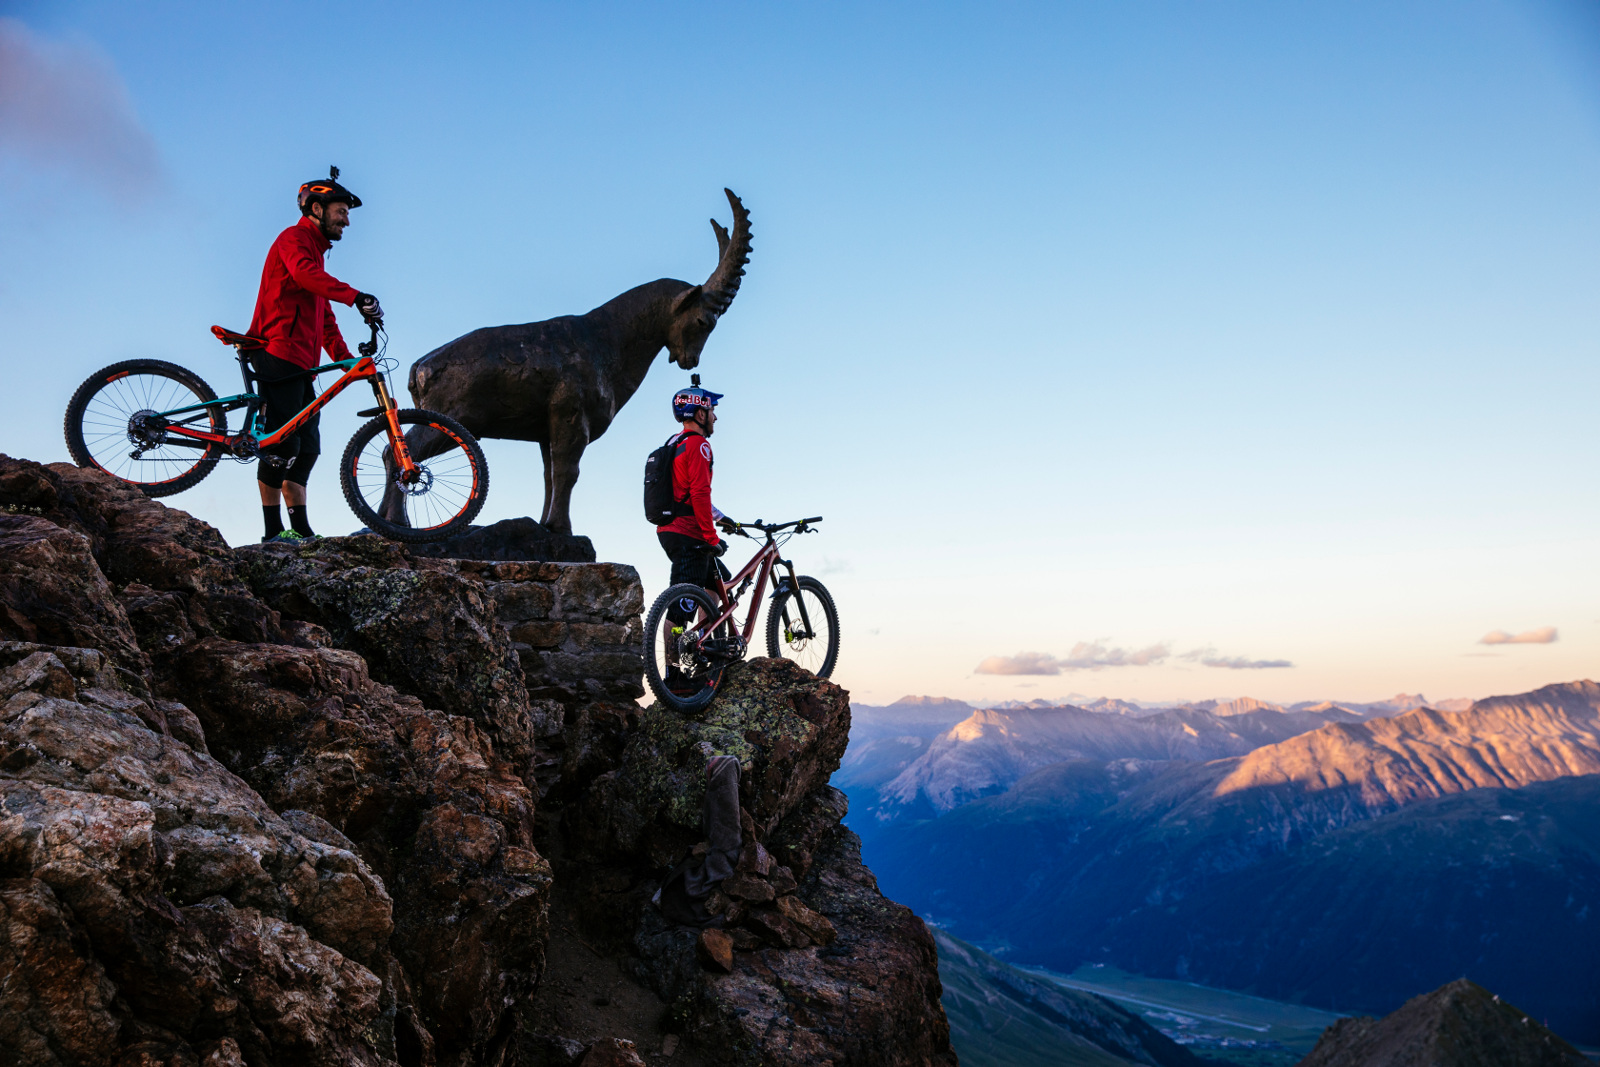 Home_of_Trails_Engadin_St.Moritz_by_Martin_Bissig_LR.jpg